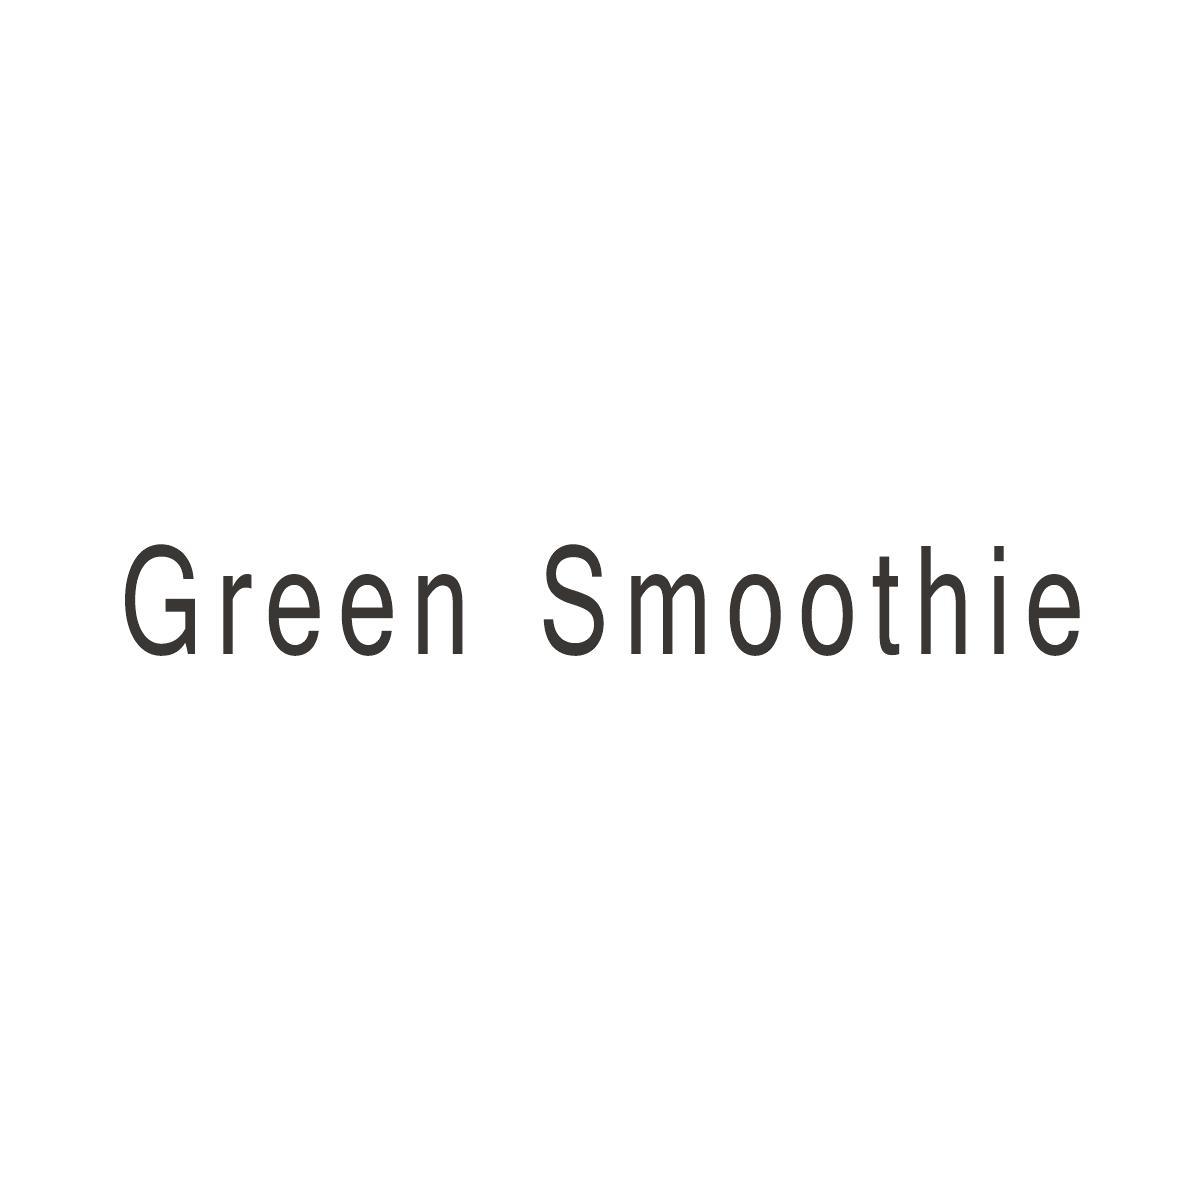 转让商标-GREEN SMOOTHIE